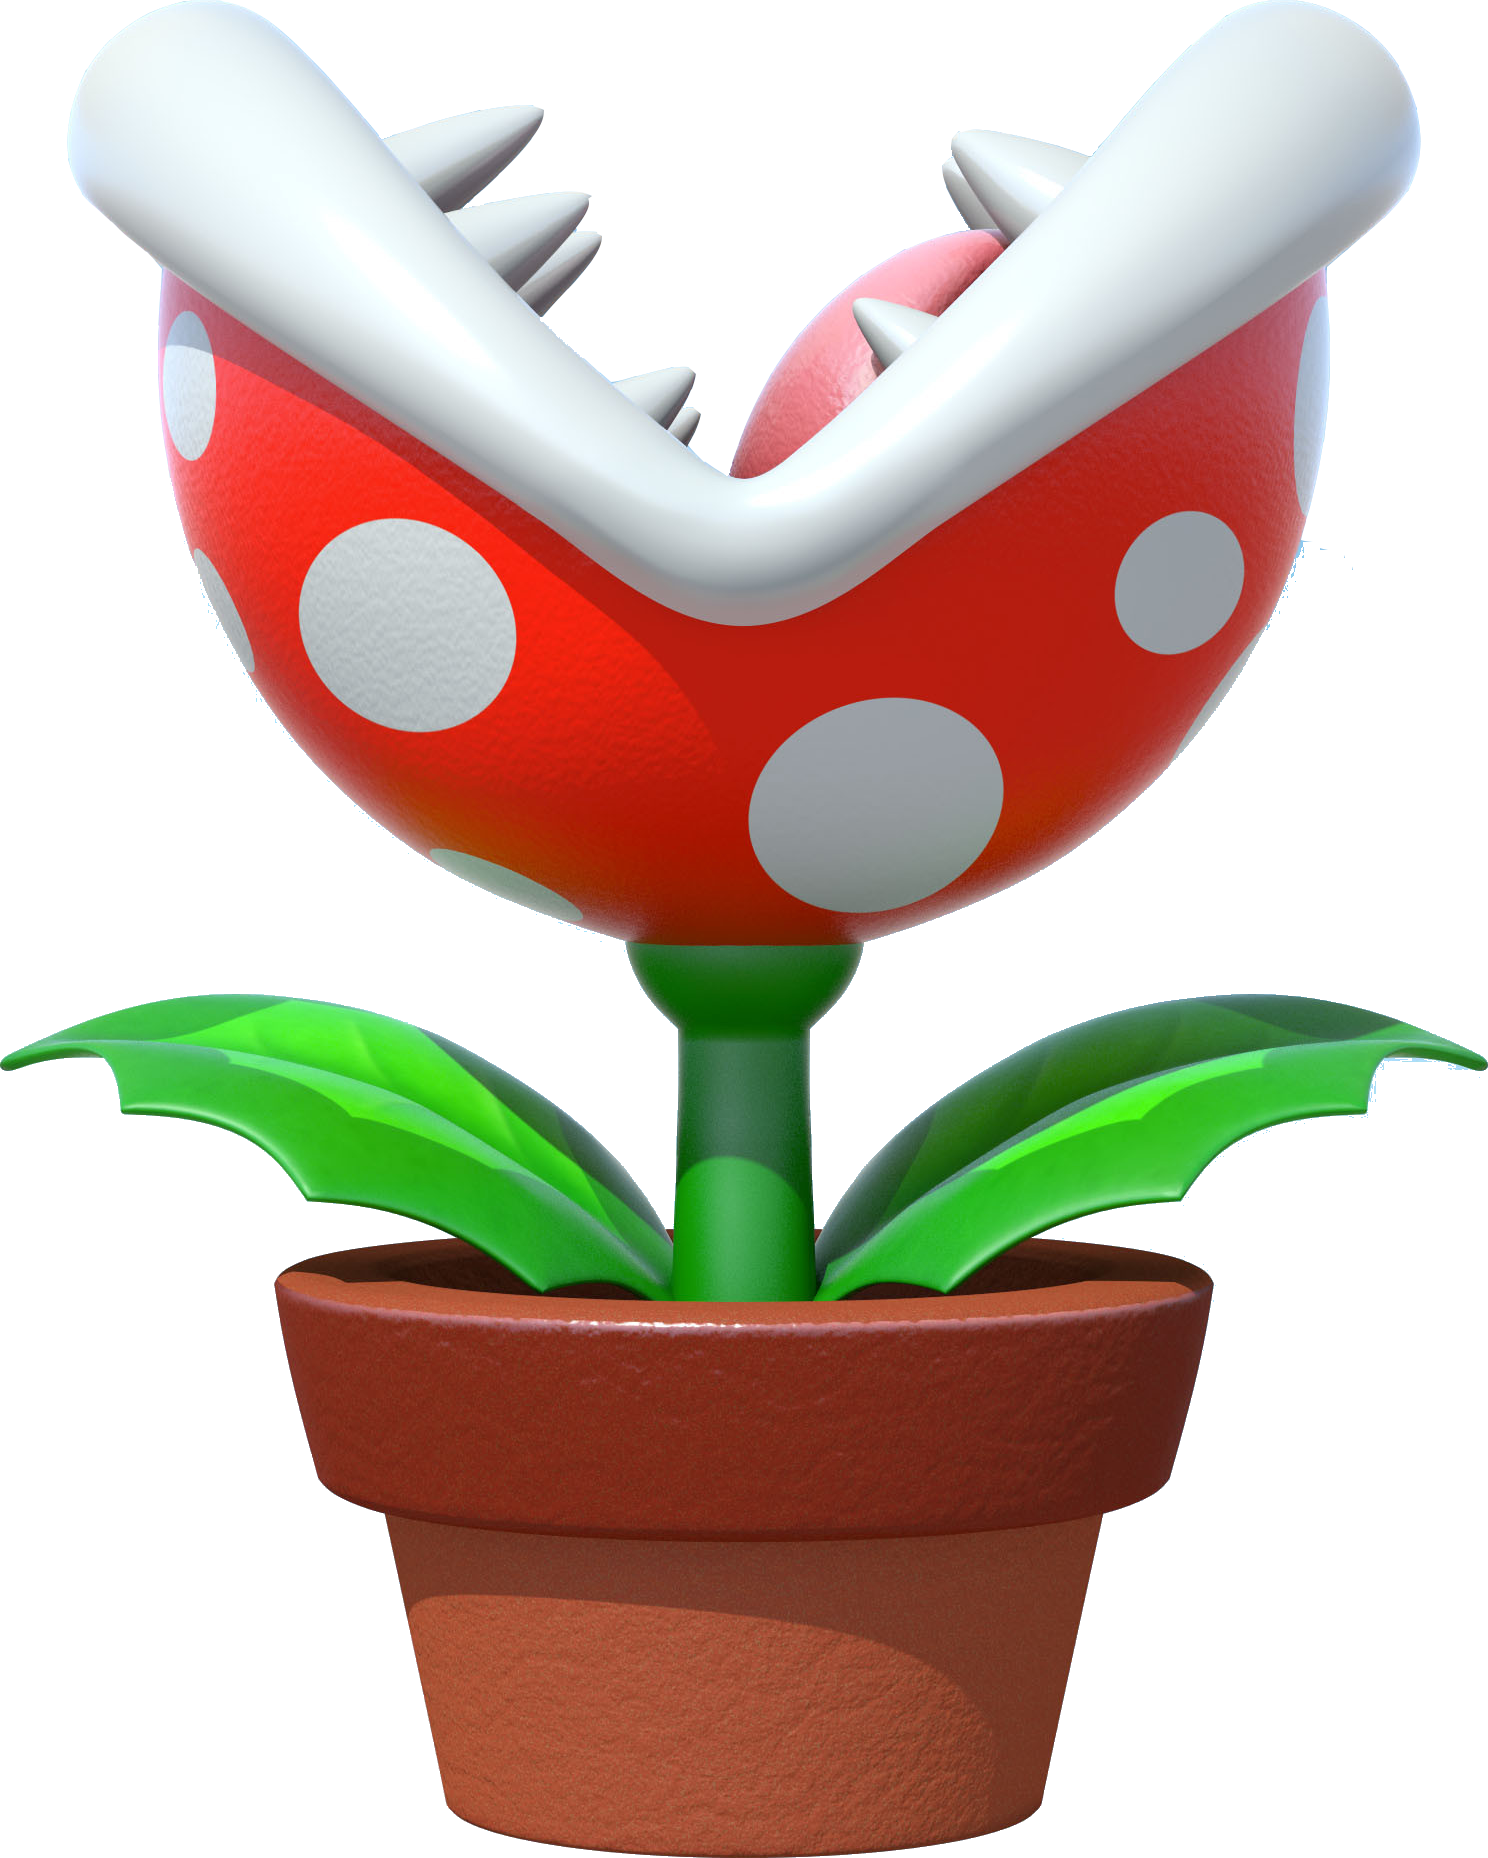 Image result for mario kart piranha plant